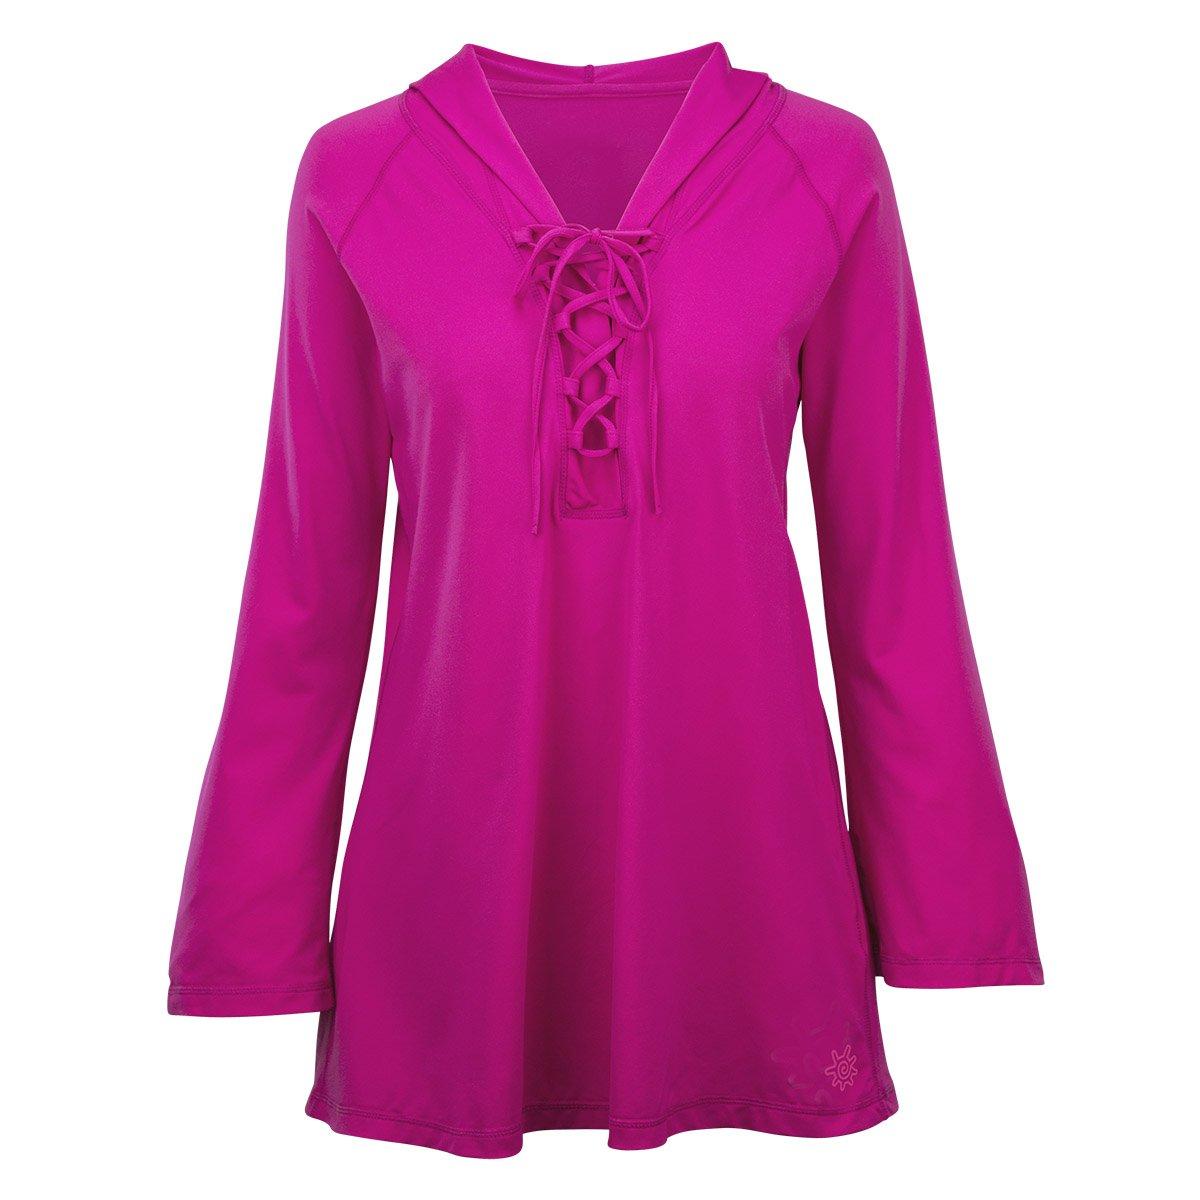 UV SKINZ UPF50+ Womens Hooded Beach Cover Up-Hot Pink-XL